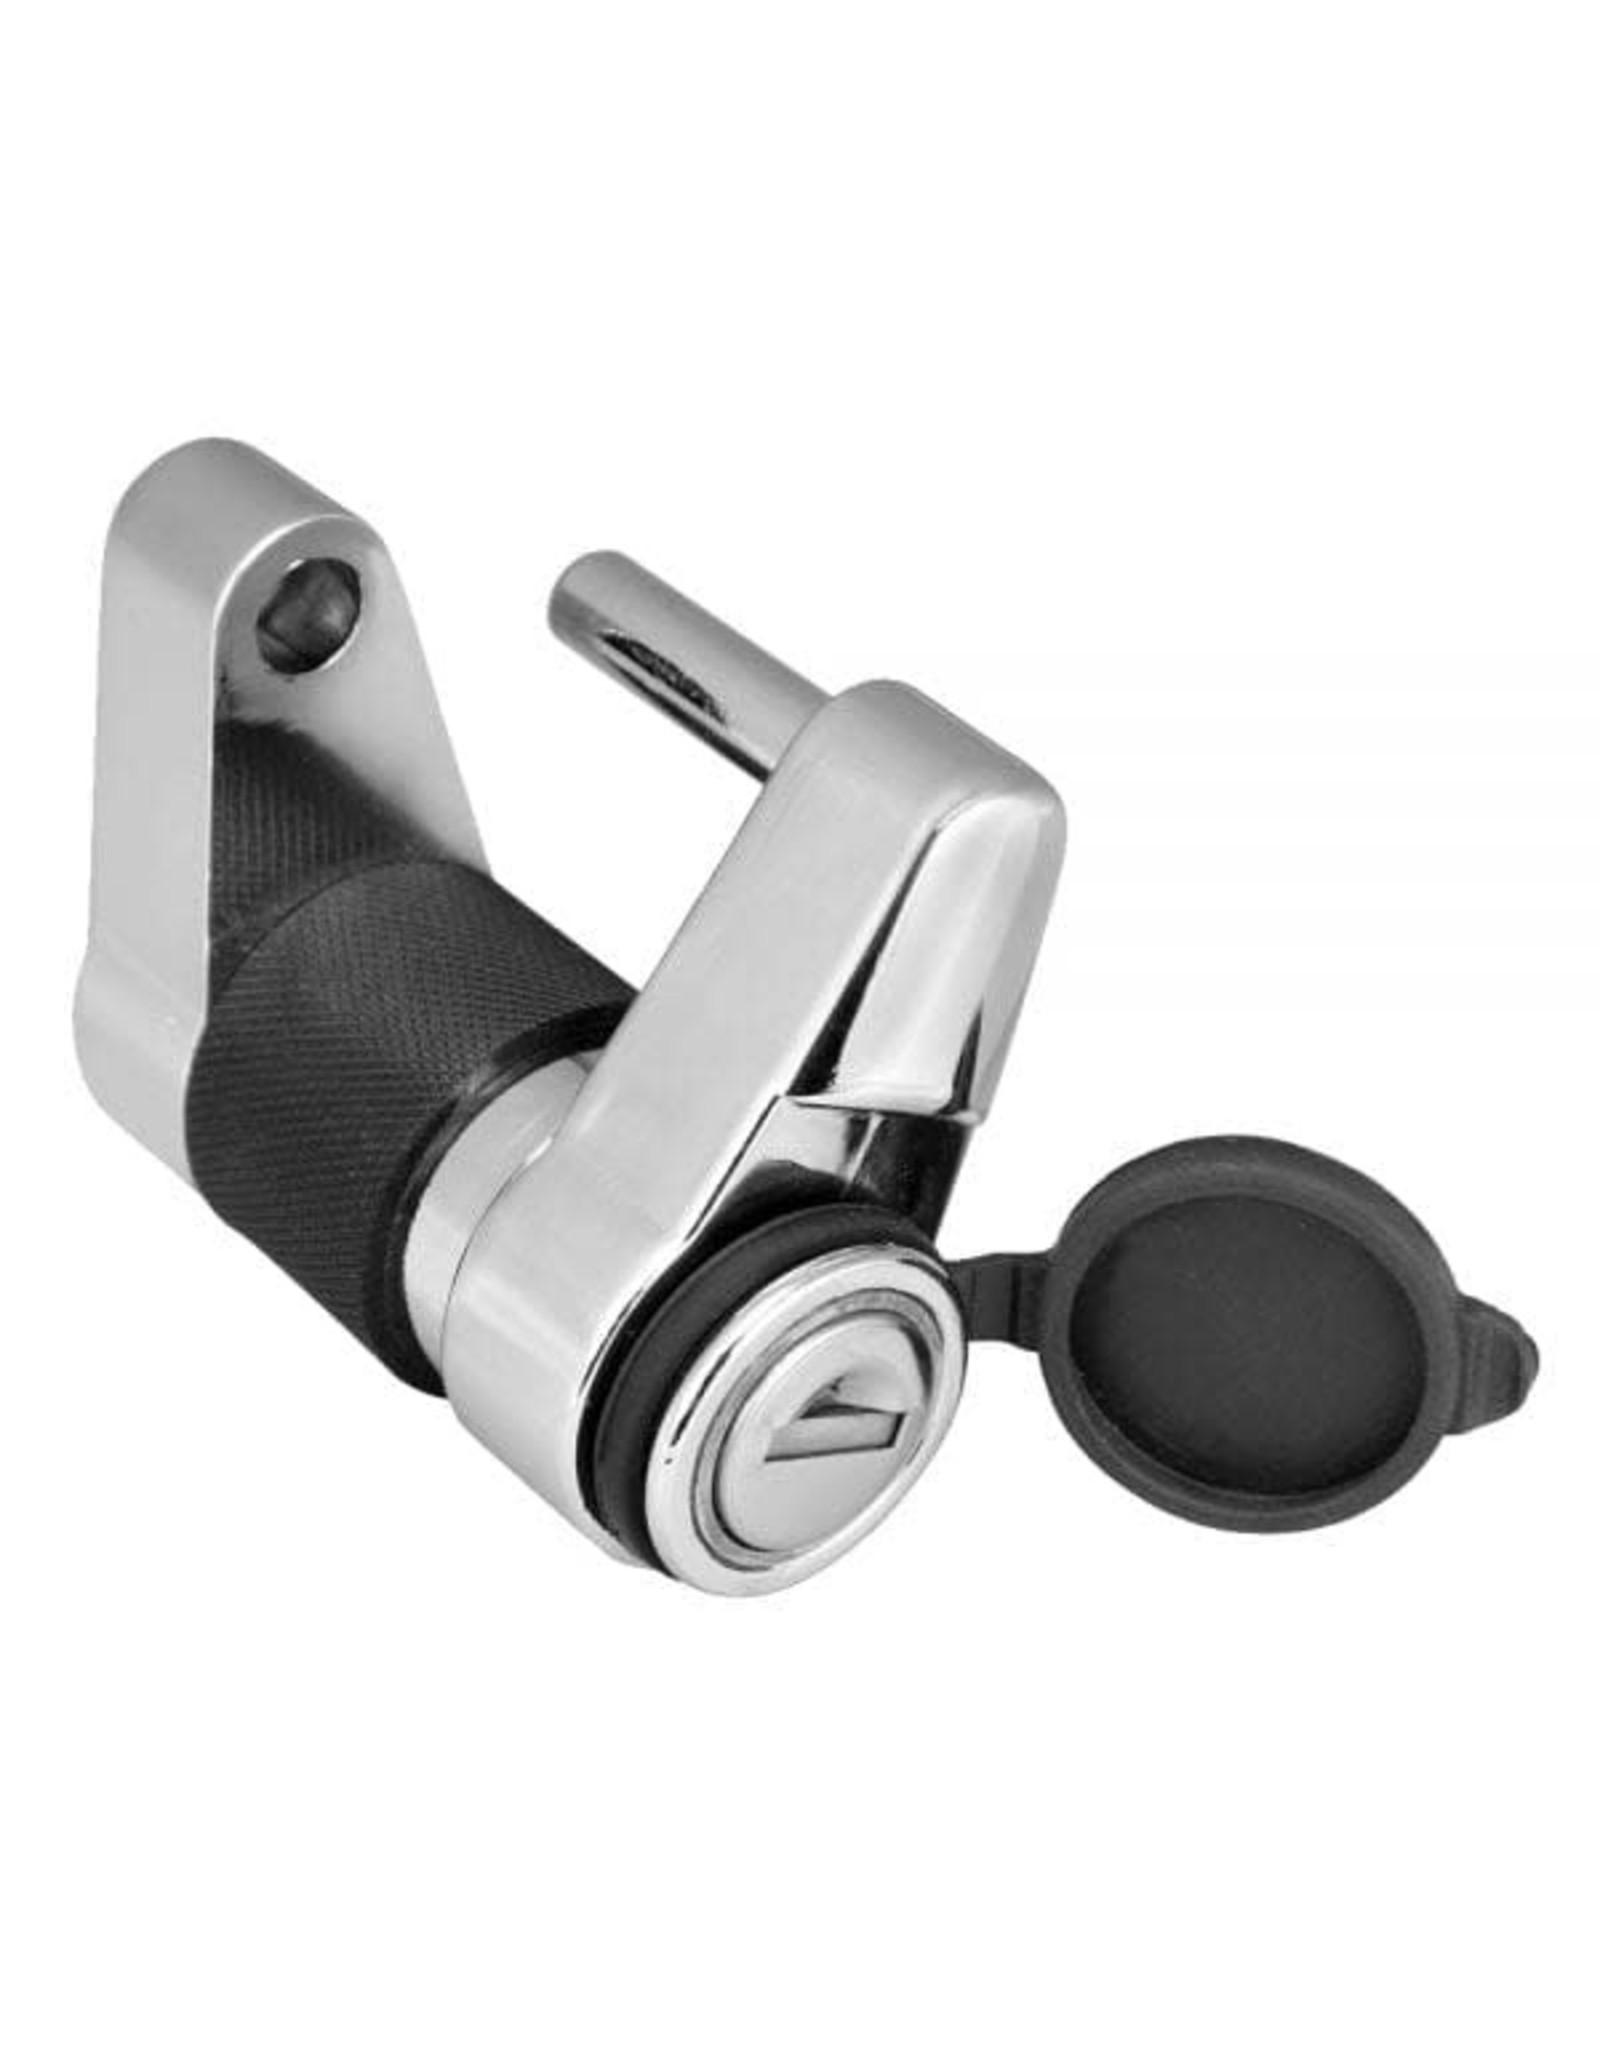 Trimax Trailer Coupler lock